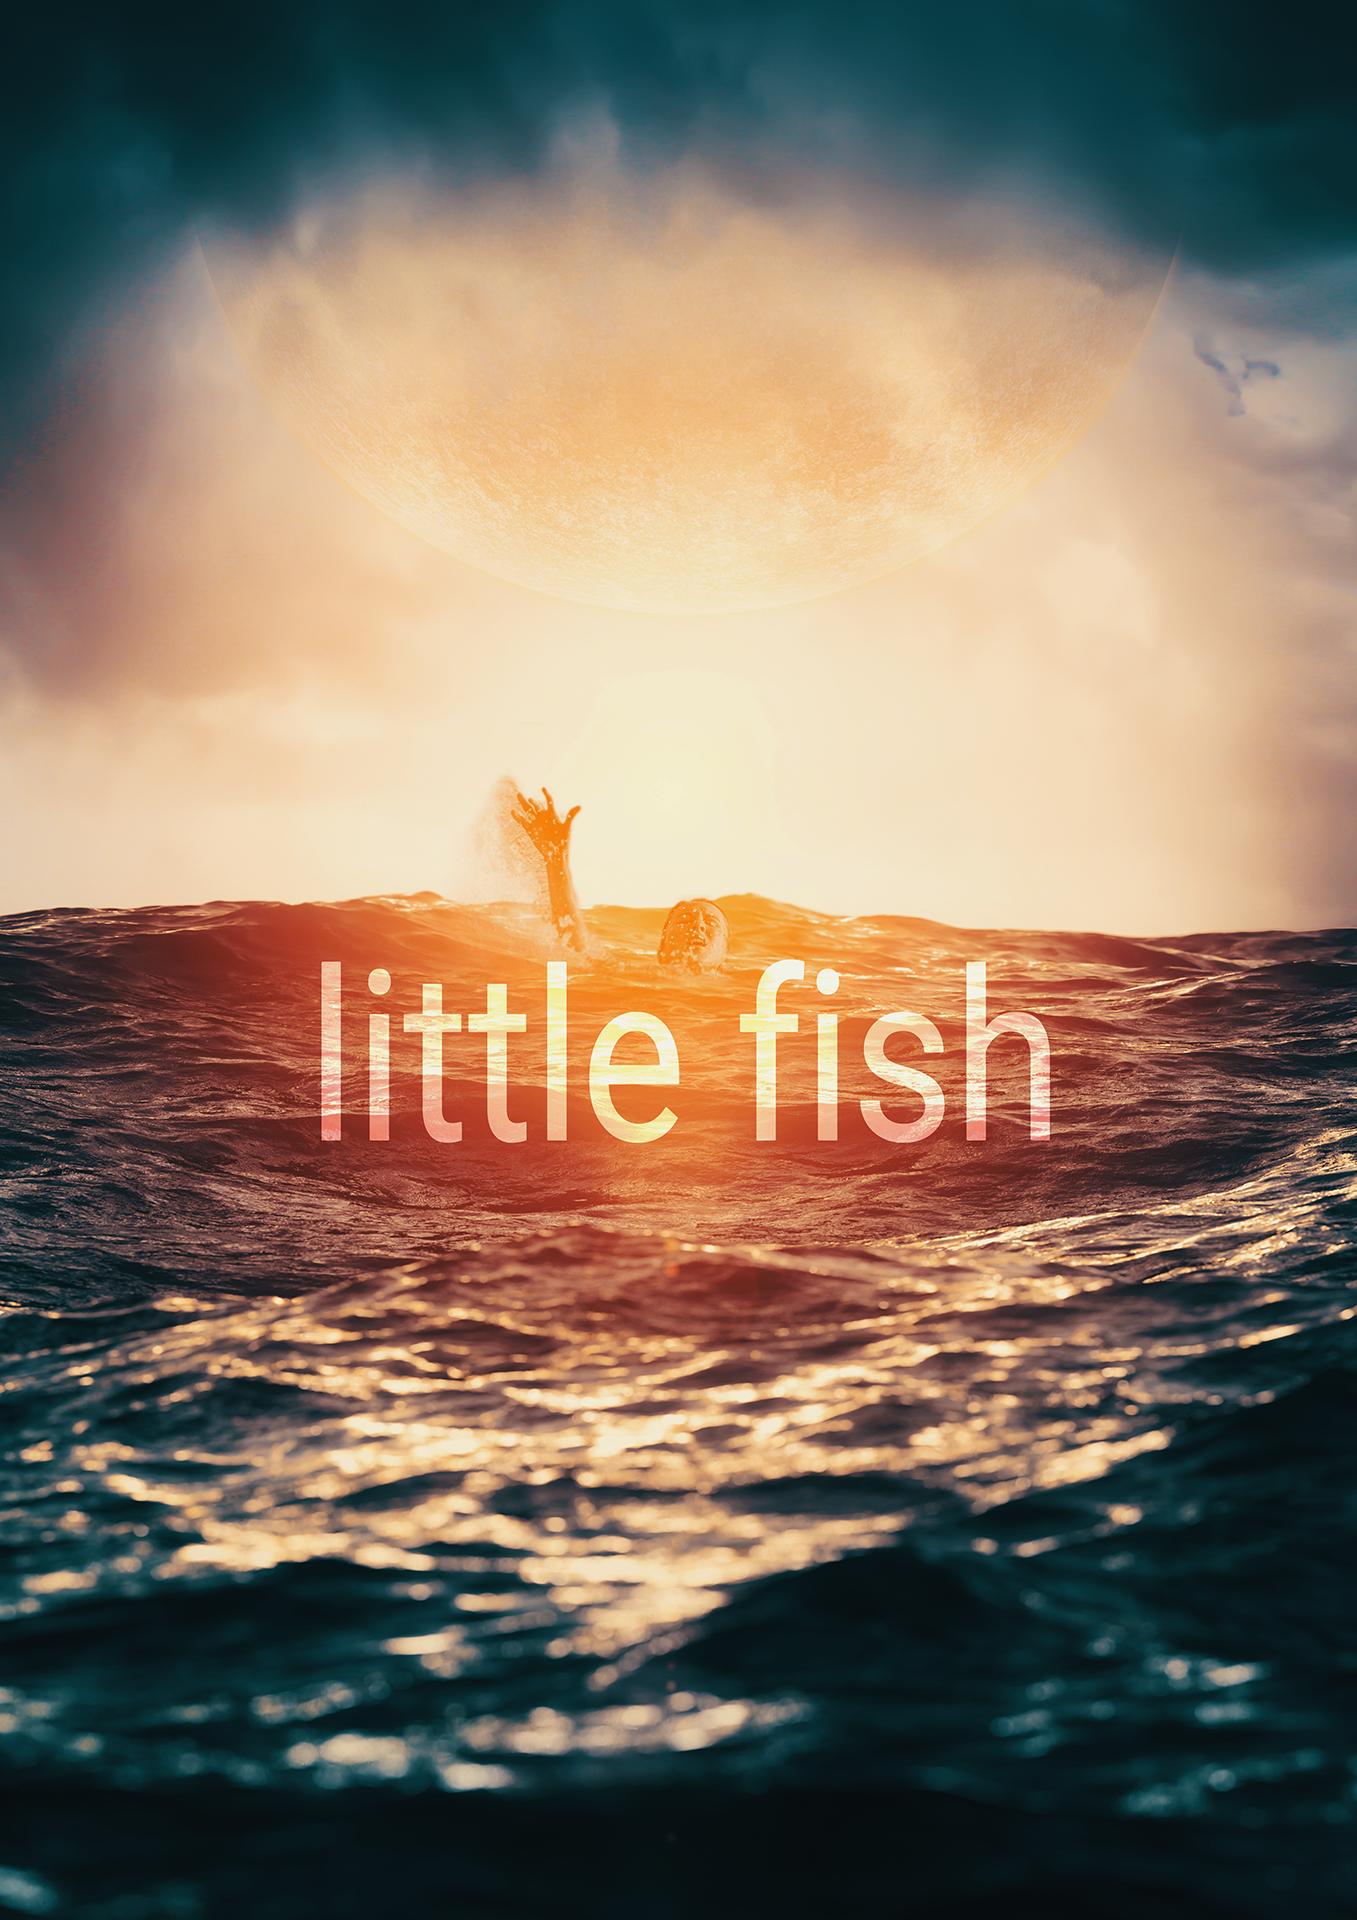 LittleFishPoster.png